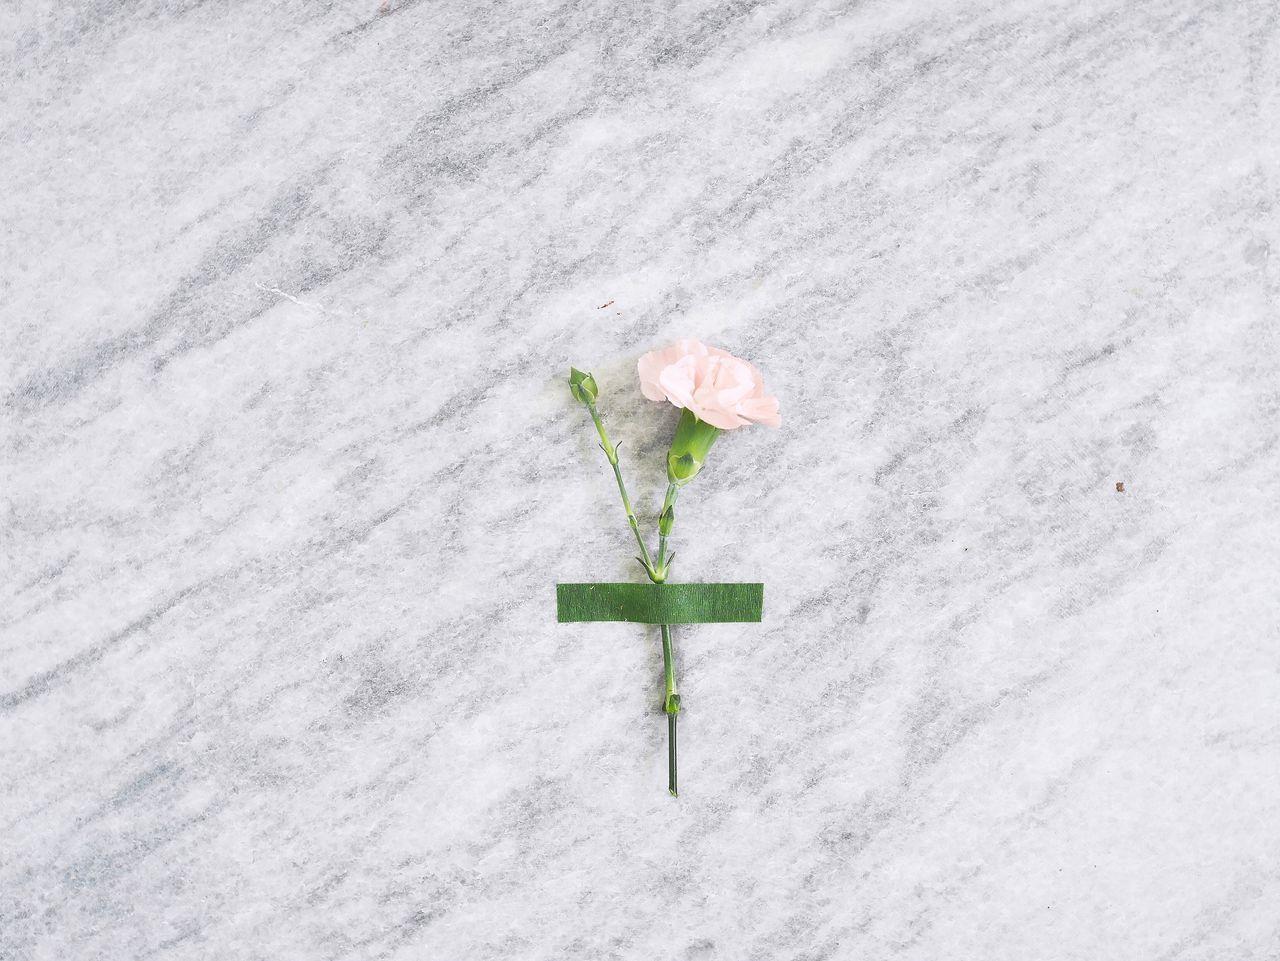 Chişinău,  Day,  Flower,  Flower Head,  Fragility